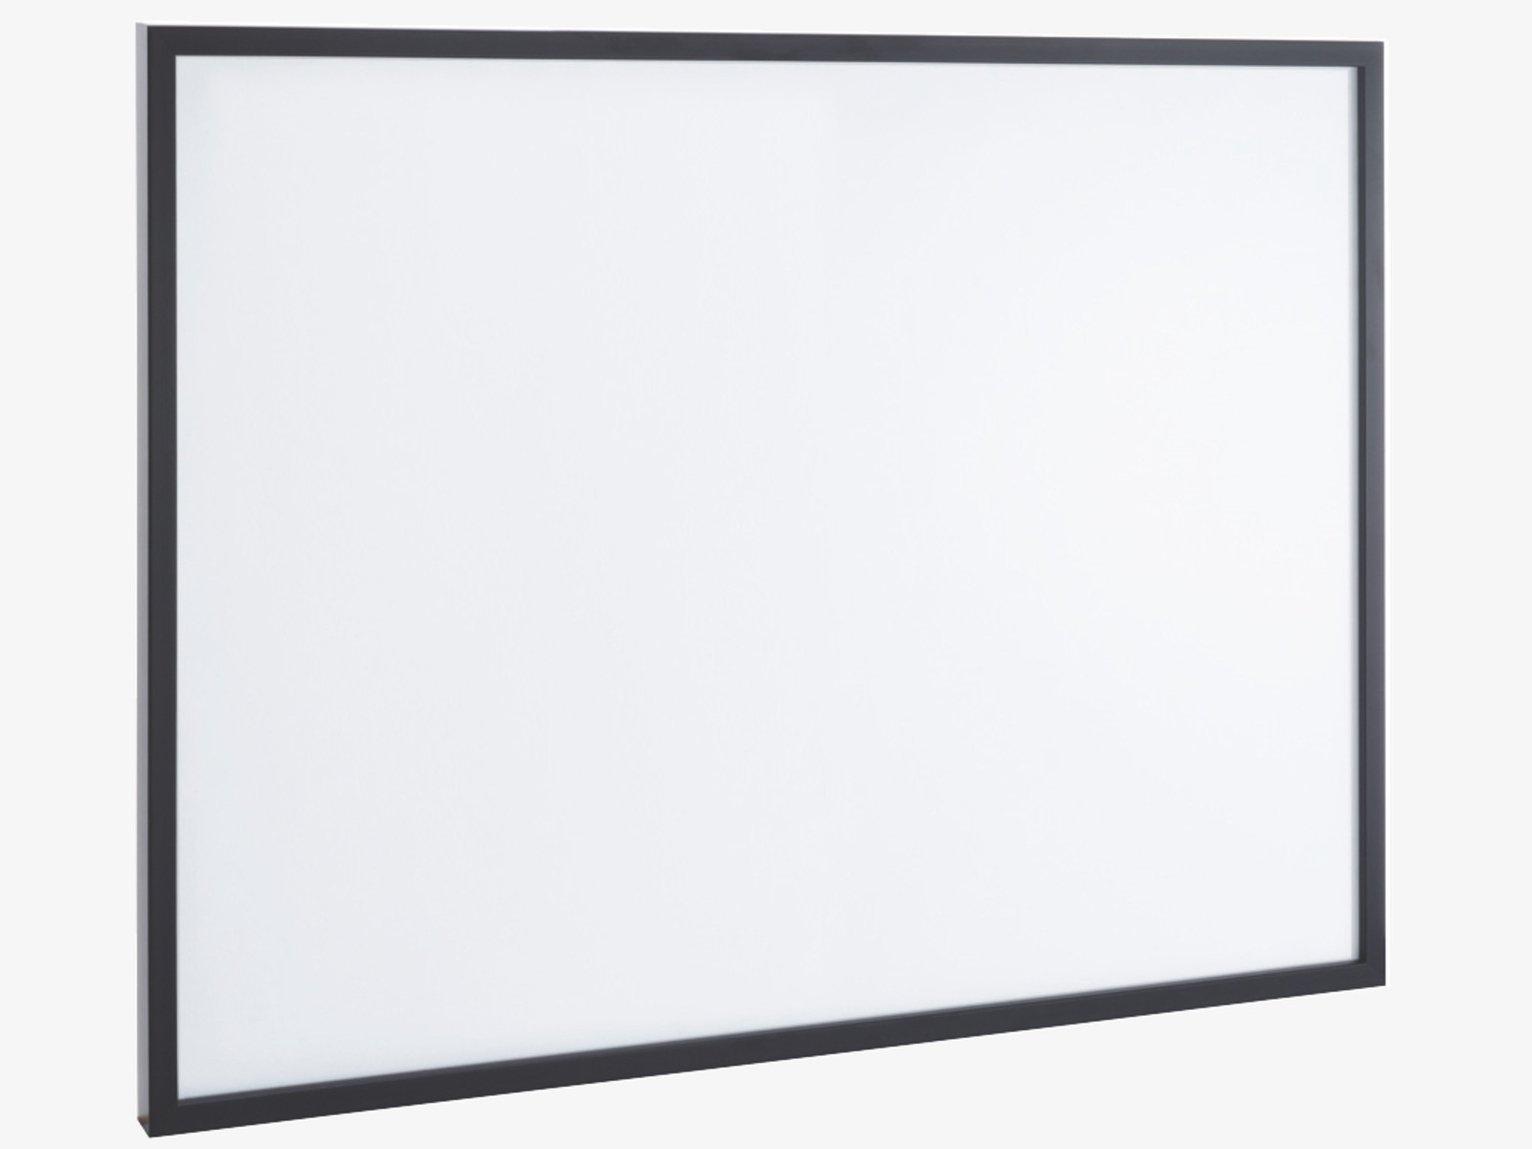 Image of Habitat 50x70cm Wall Frame - Dark Birch.